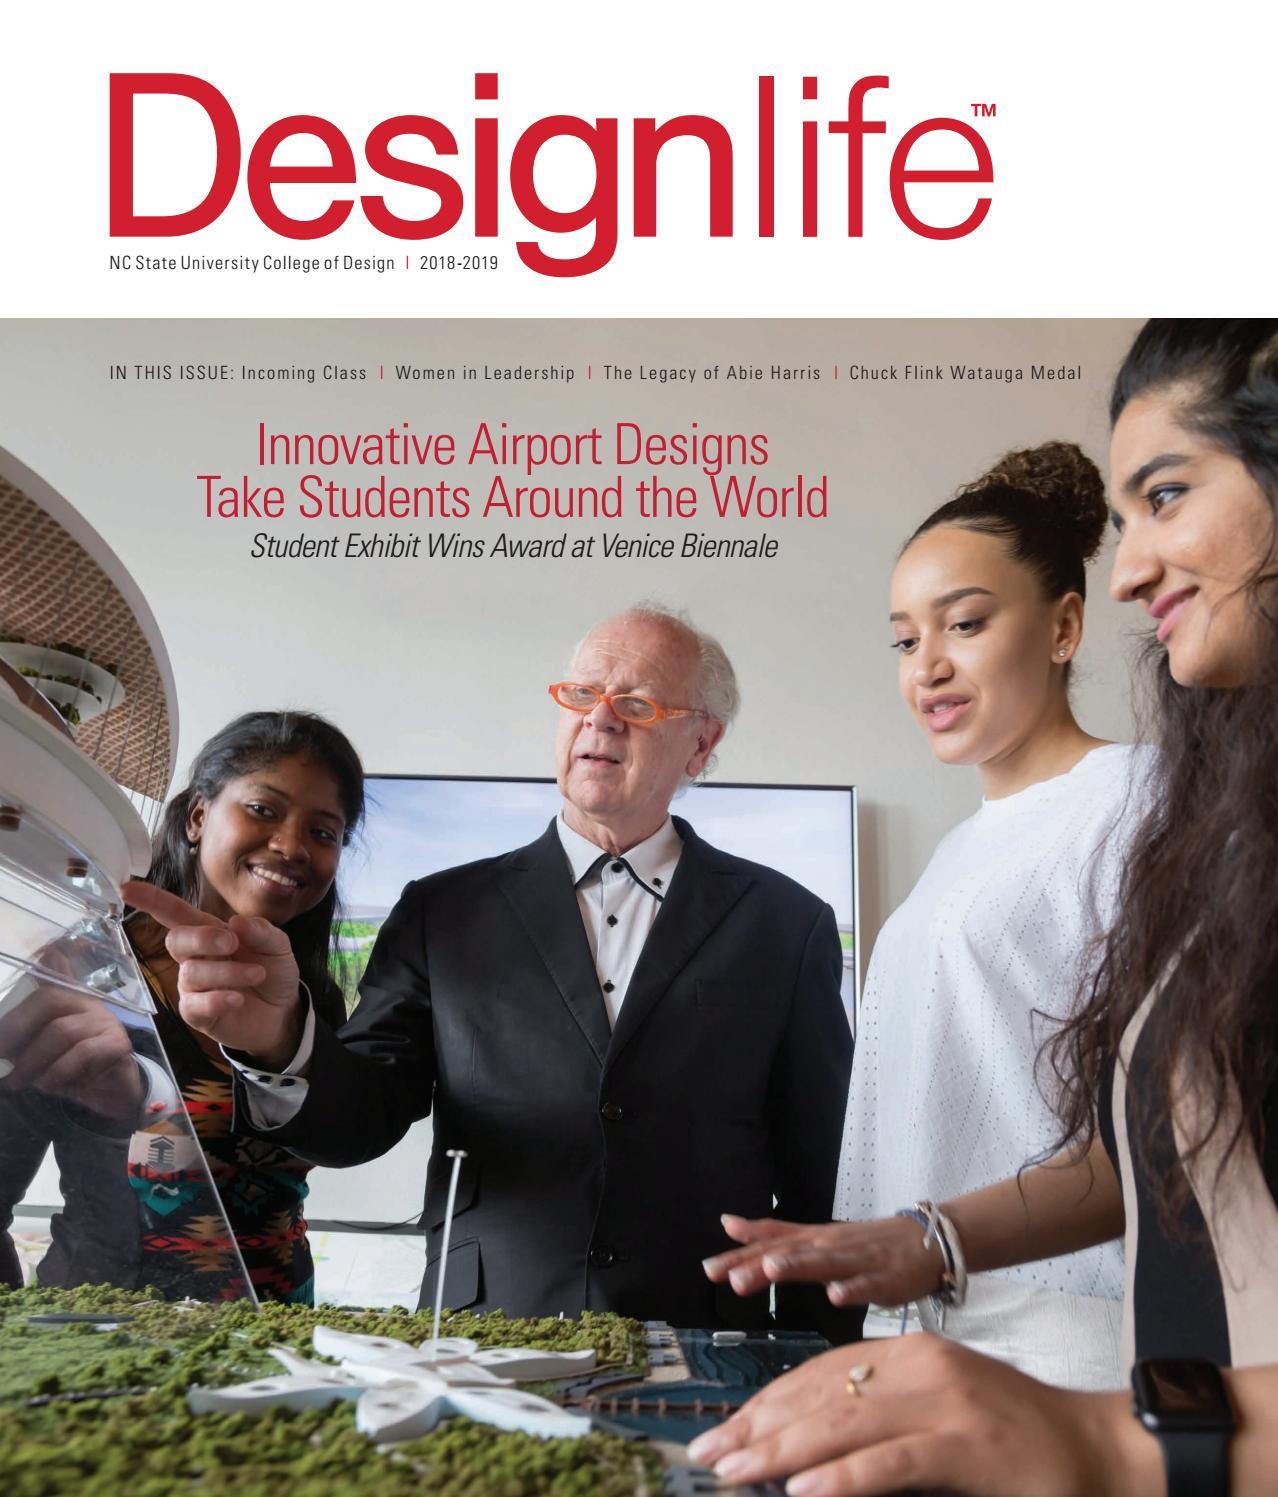 Designlife Magazine 2018 2019 By Nc State College Of Design Issuu